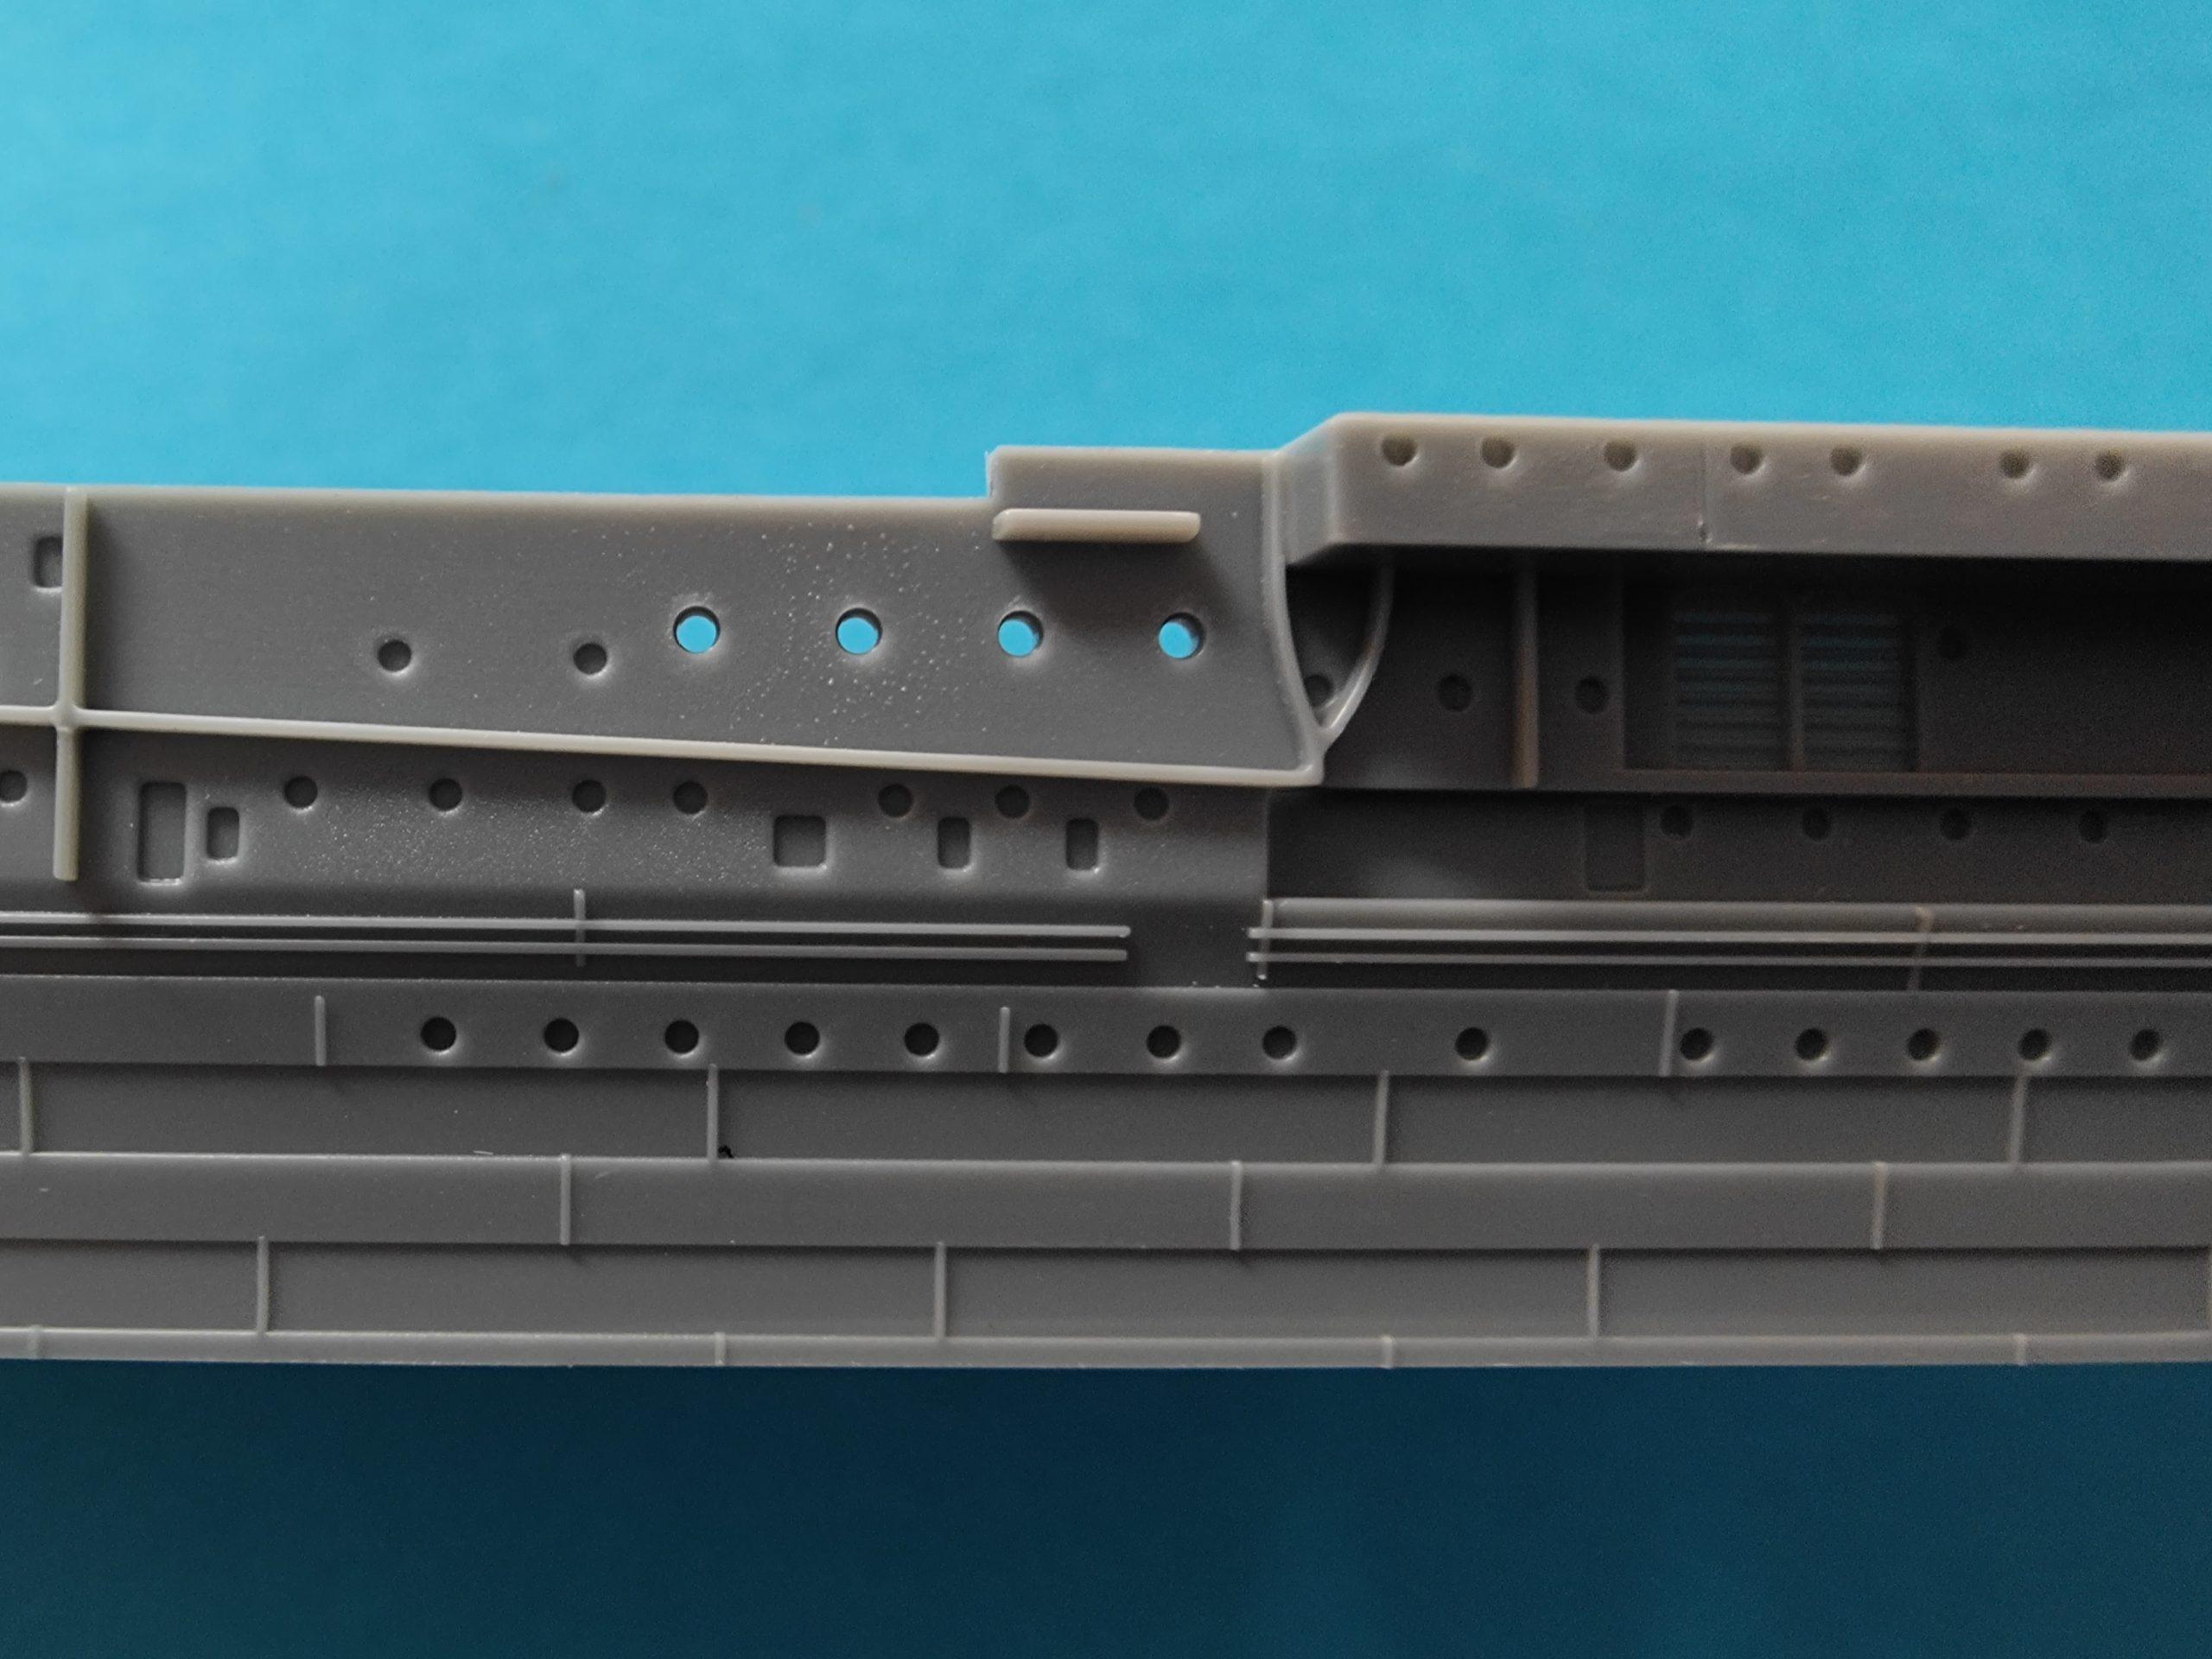 meng_enterprise013-scaled U.S. Navy aircraft carrier Enterprise (CV-6) in 1:700 von Meng